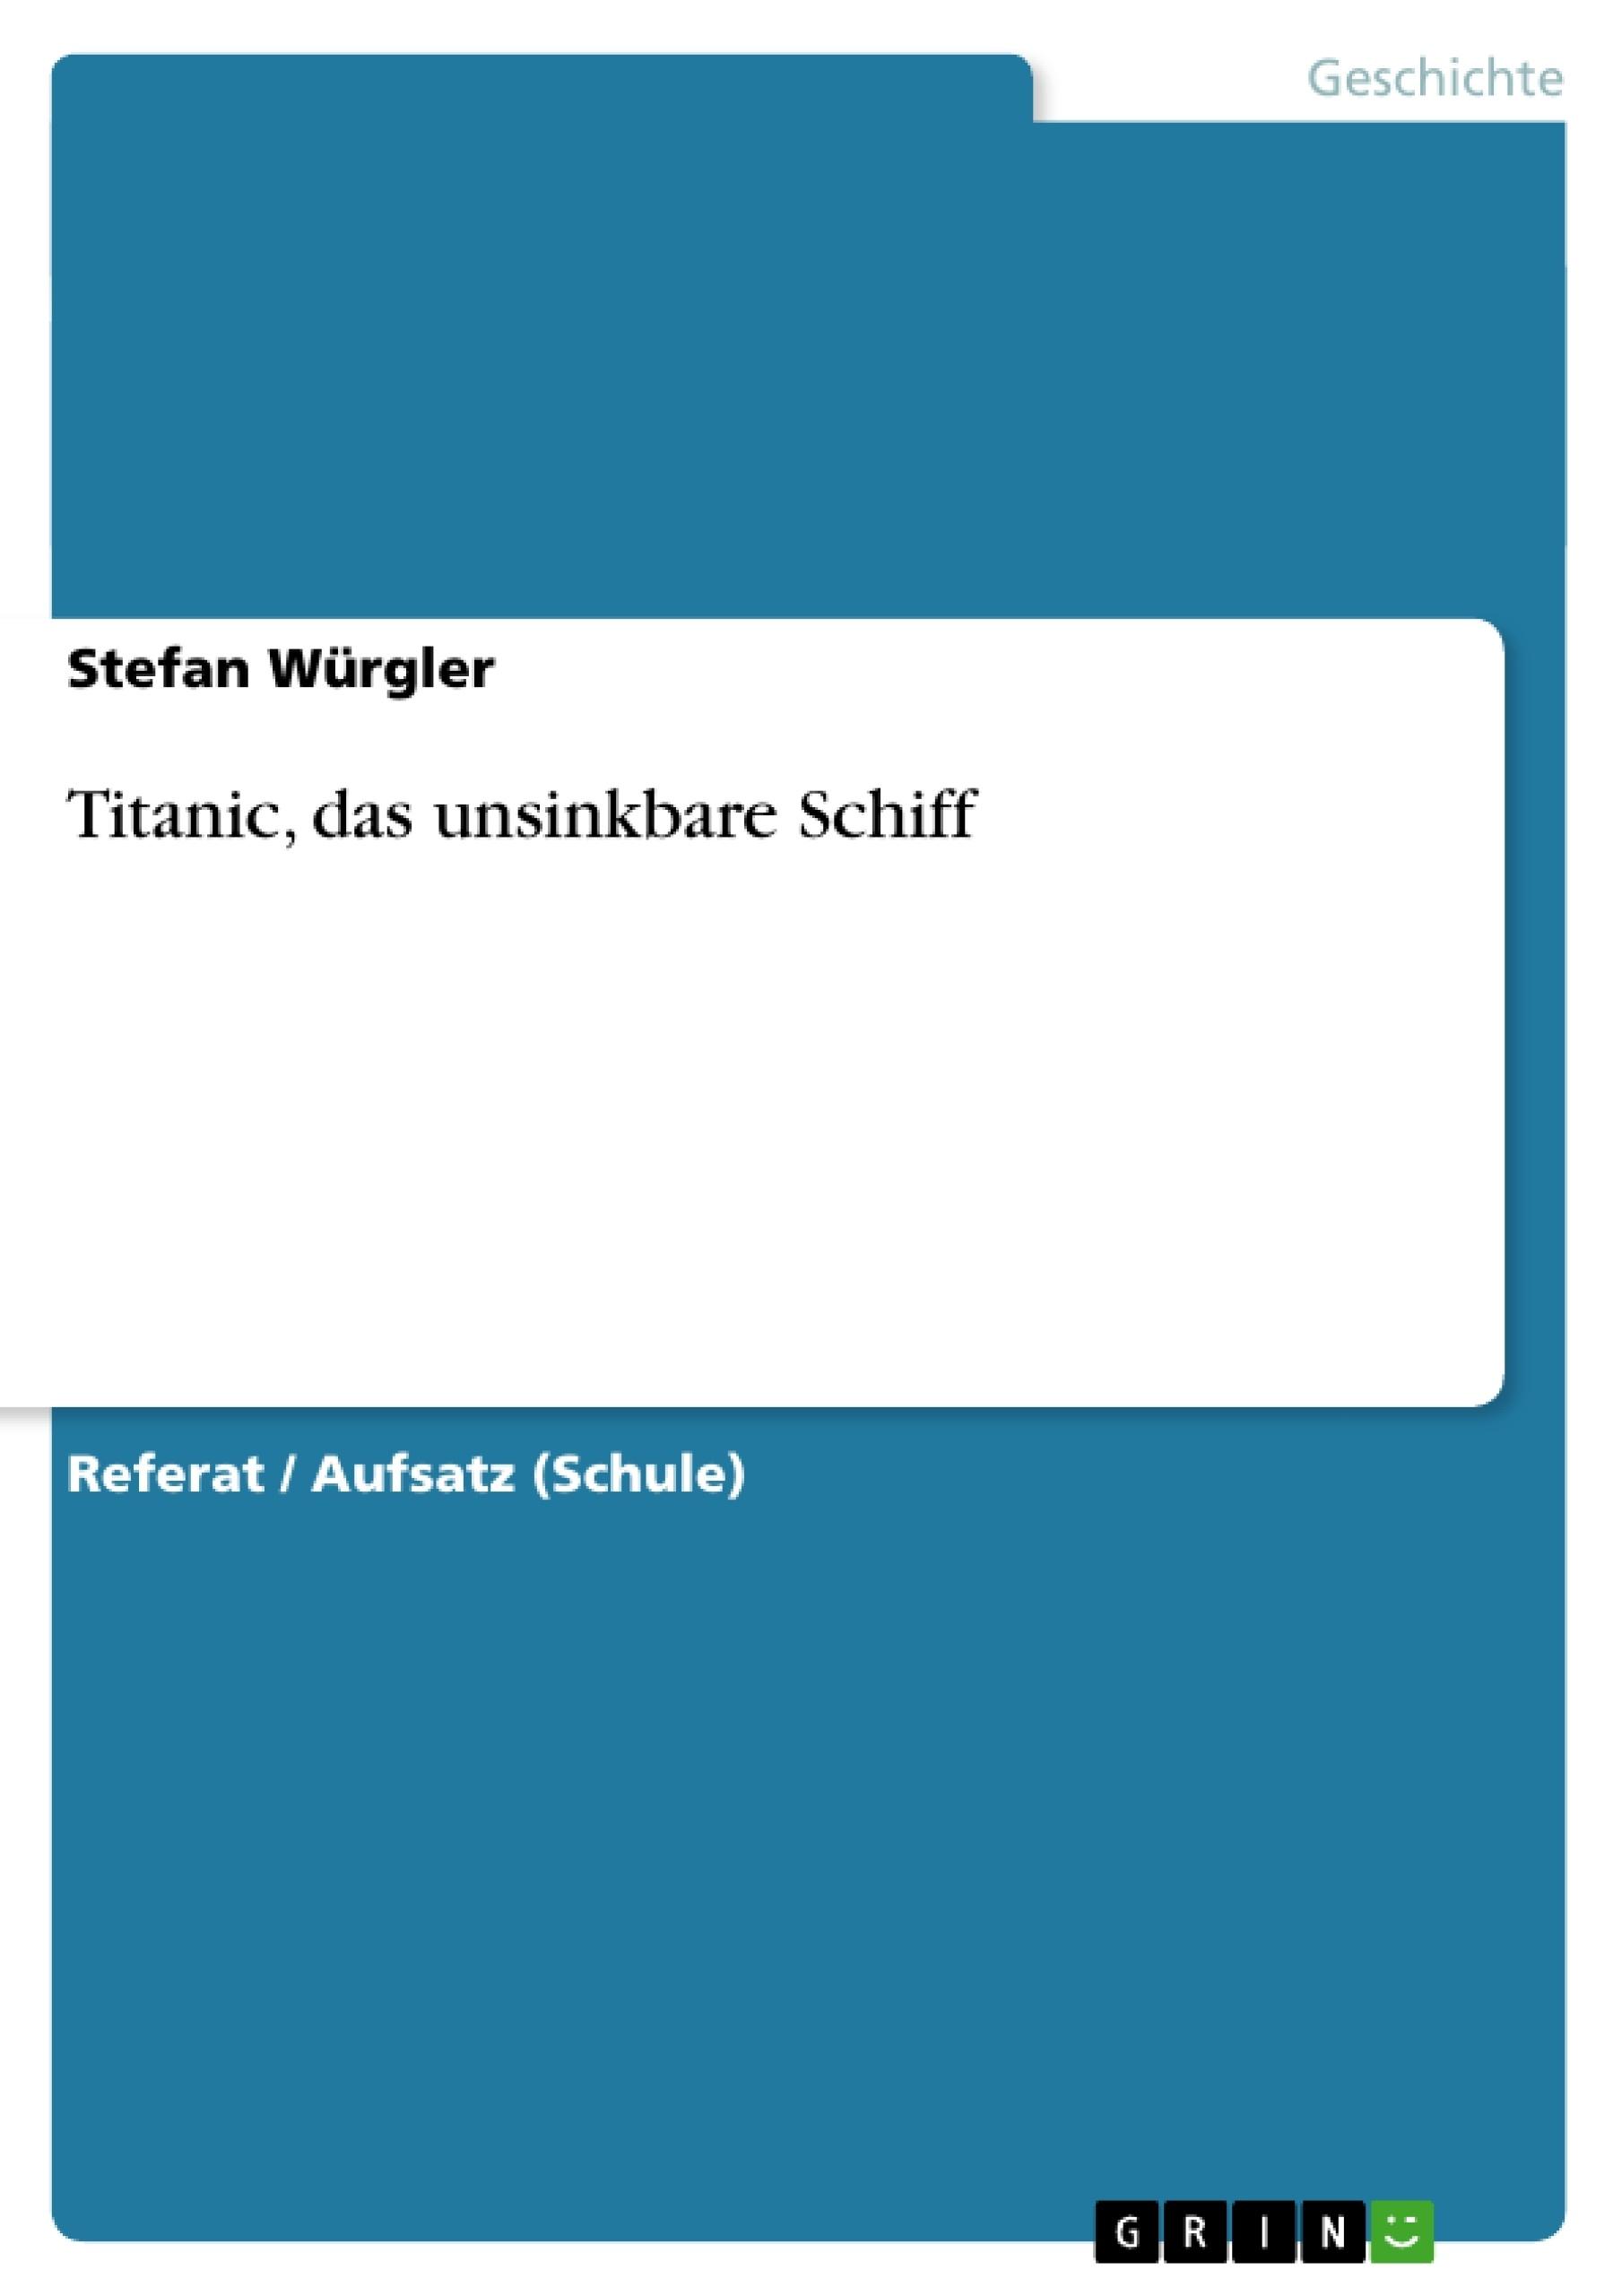 Titel: Titanic, das unsinkbare Schiff